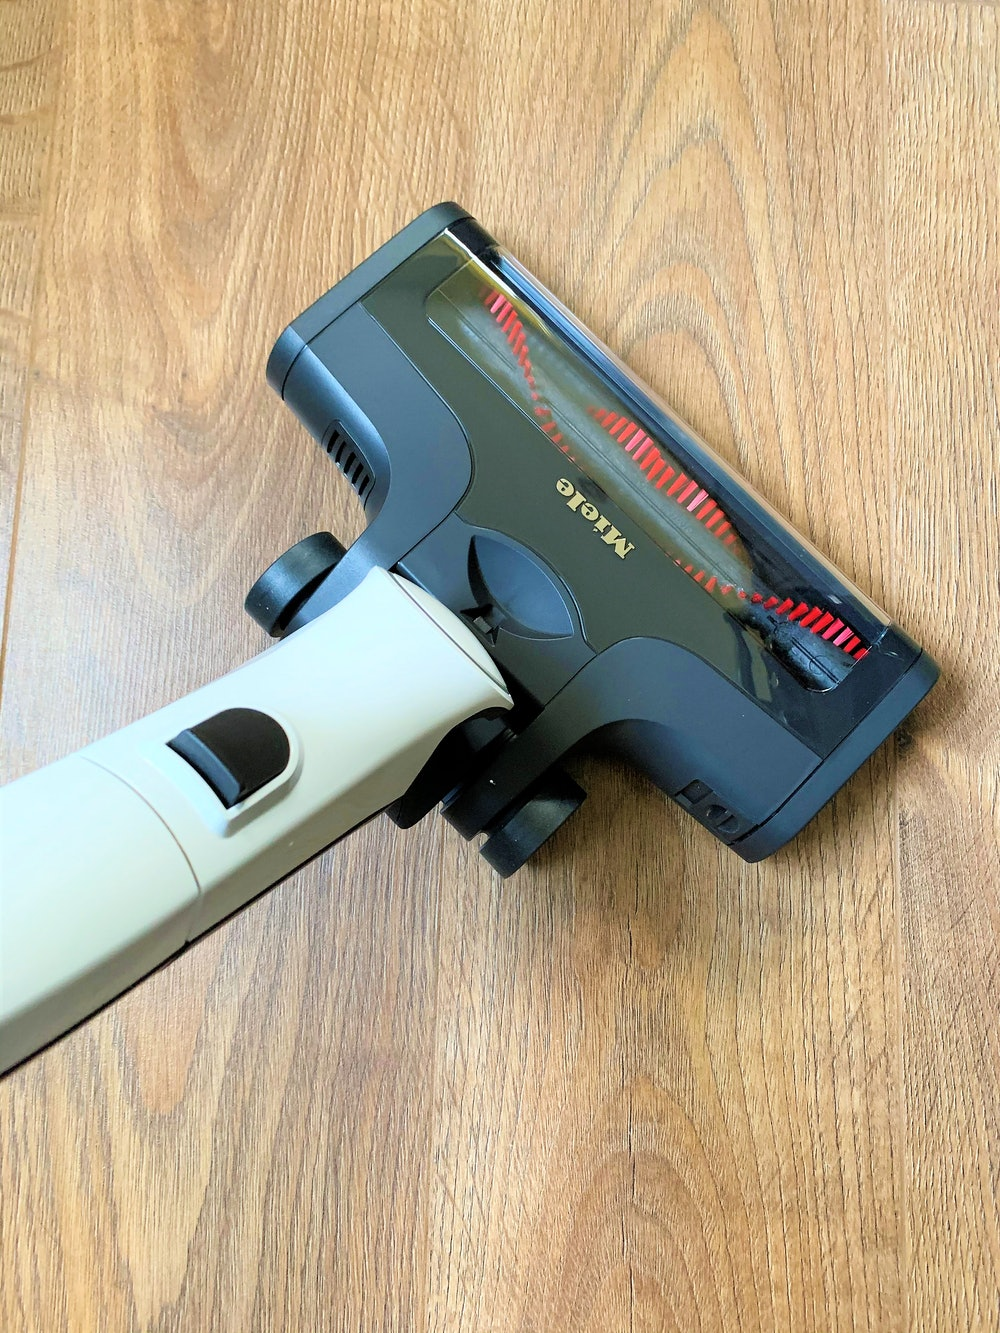 Miele cordless vacuum